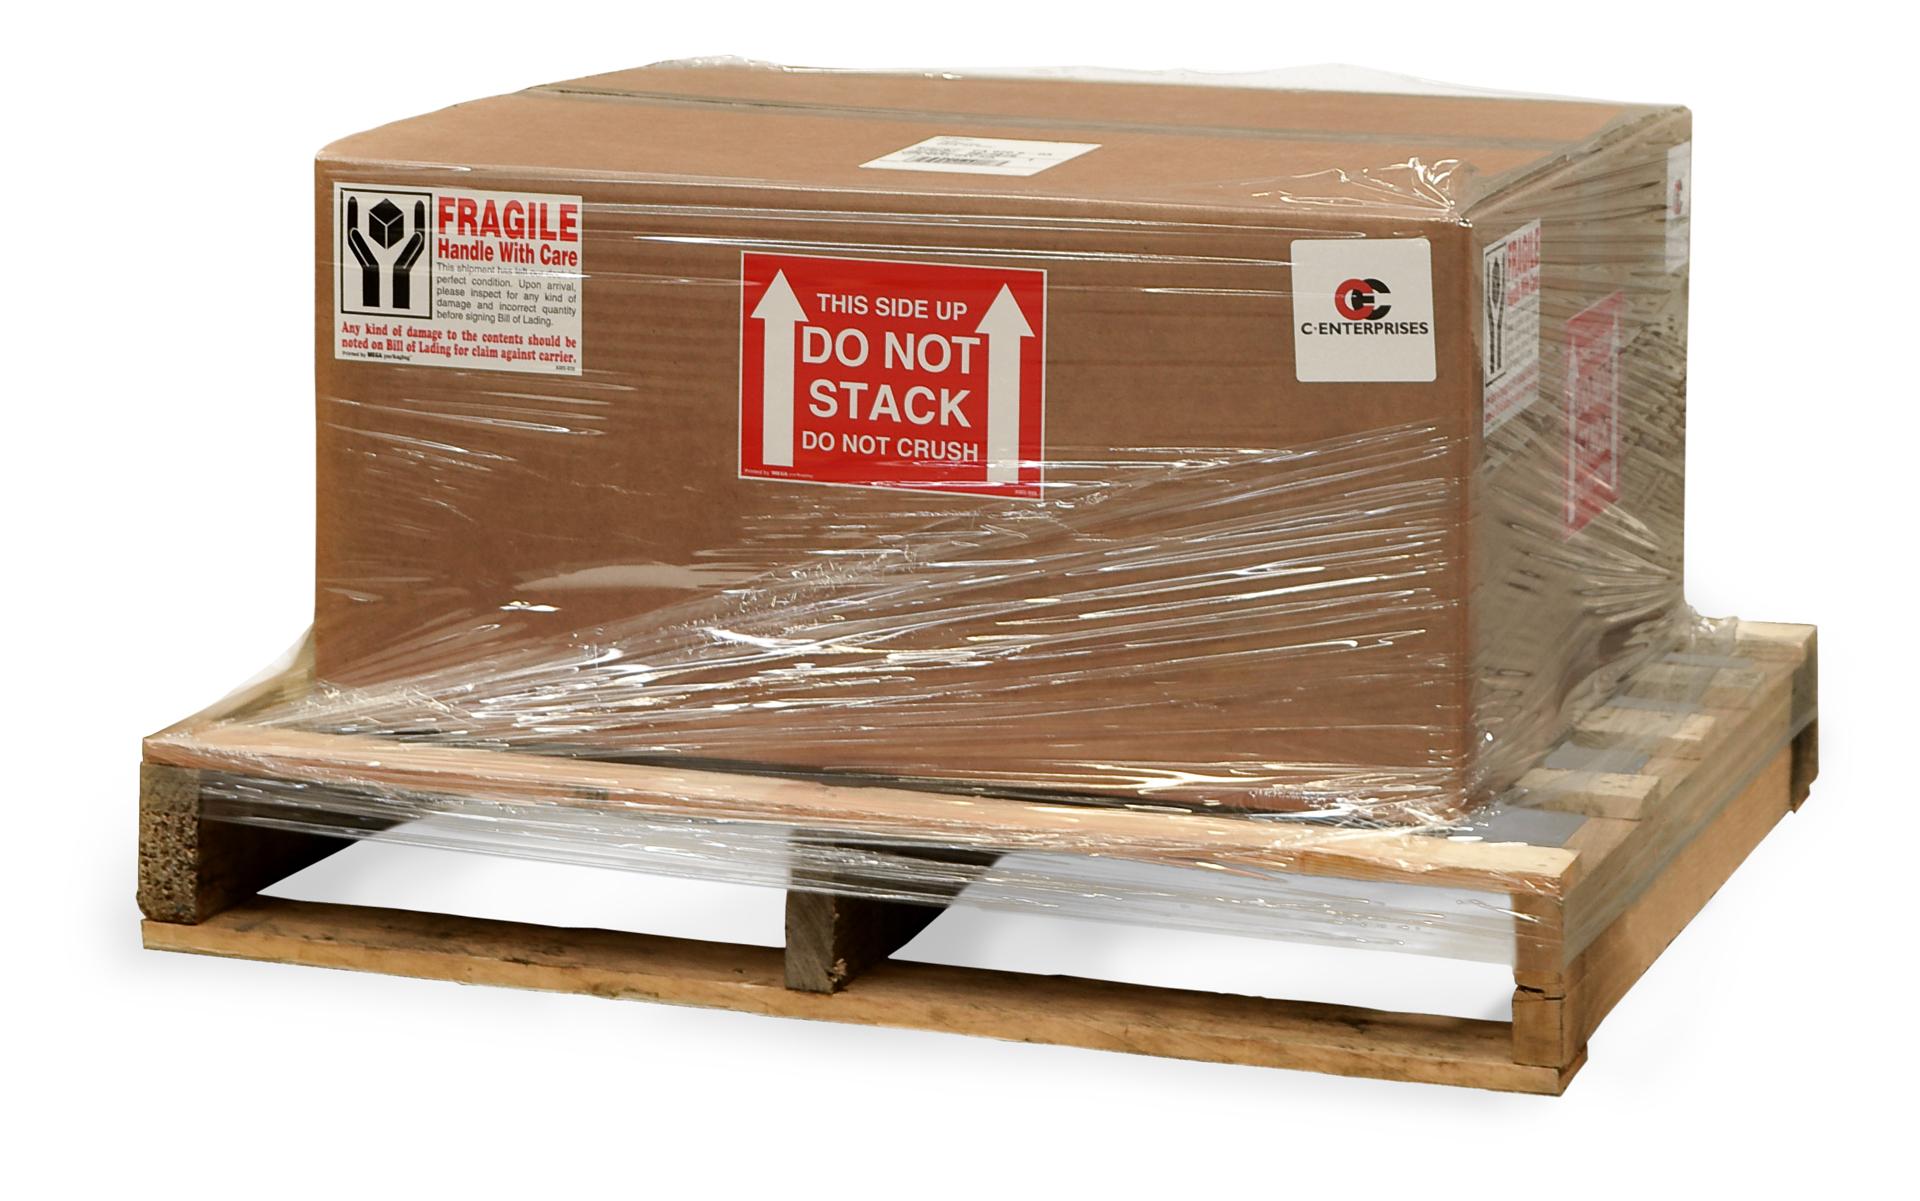 Cust.Freight.Packaging.Pallet.20170124151723.1920x1201white (1).jpg